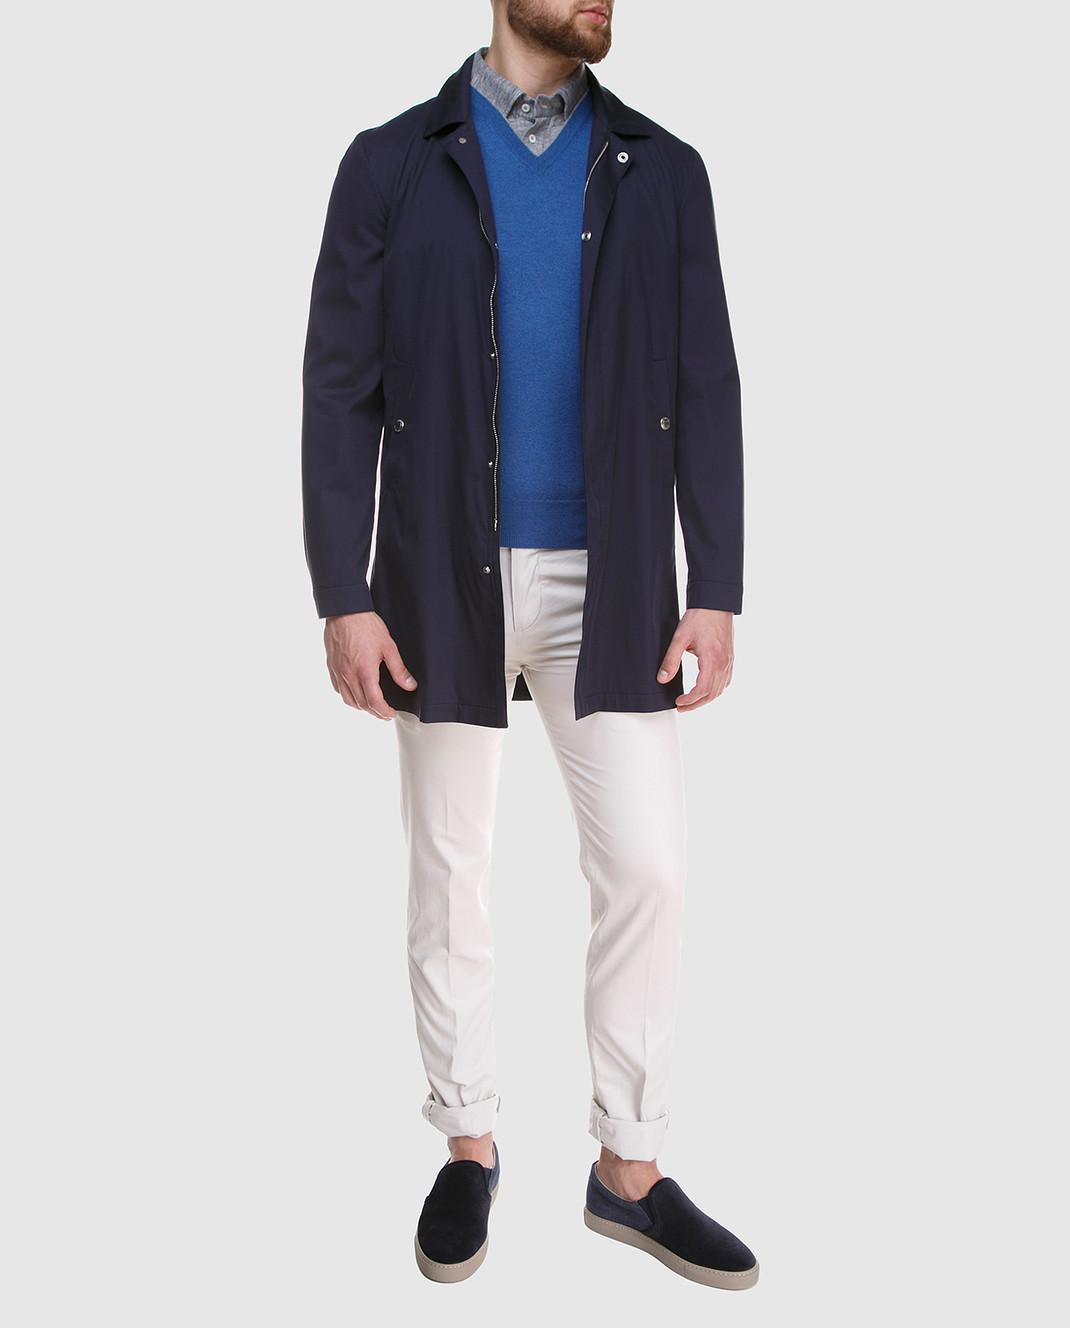 Brunello Cucinelli Синий пуловер M2200162 изображение 2